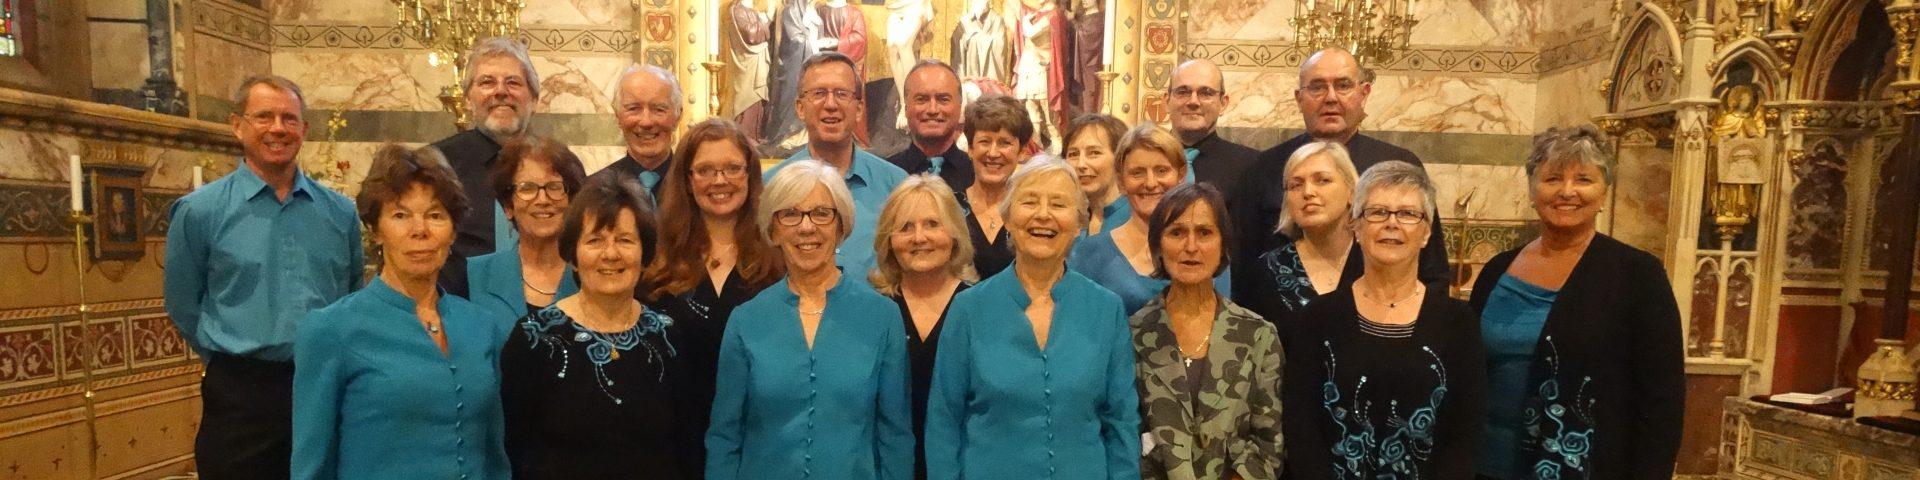 The Avon Singers